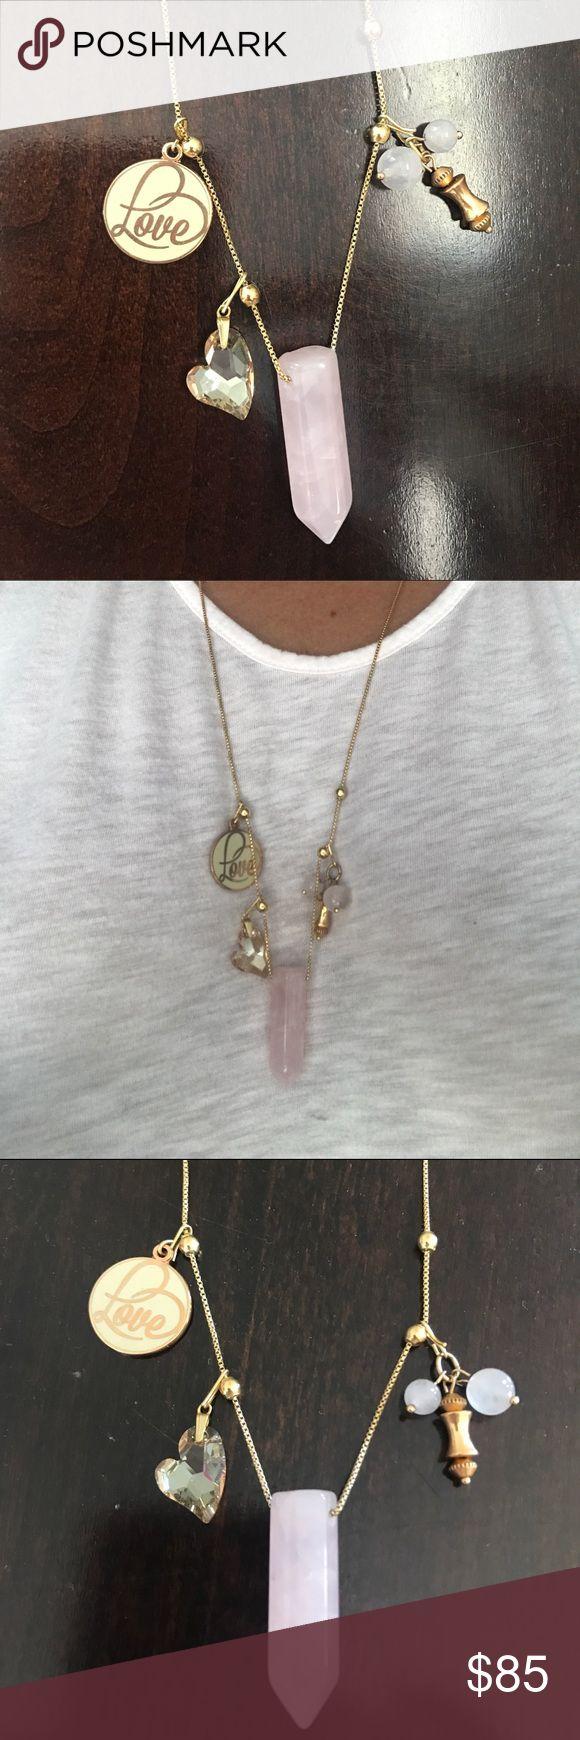 Alex & Ani Rose Quartz Necklace Alex & Ani Rose Quartz Necklace. Include rose quartz necklace with 3 charms. Love, rose quartz dangle, and Swarovski heart. Alex And Ani Jewelry Necklaces